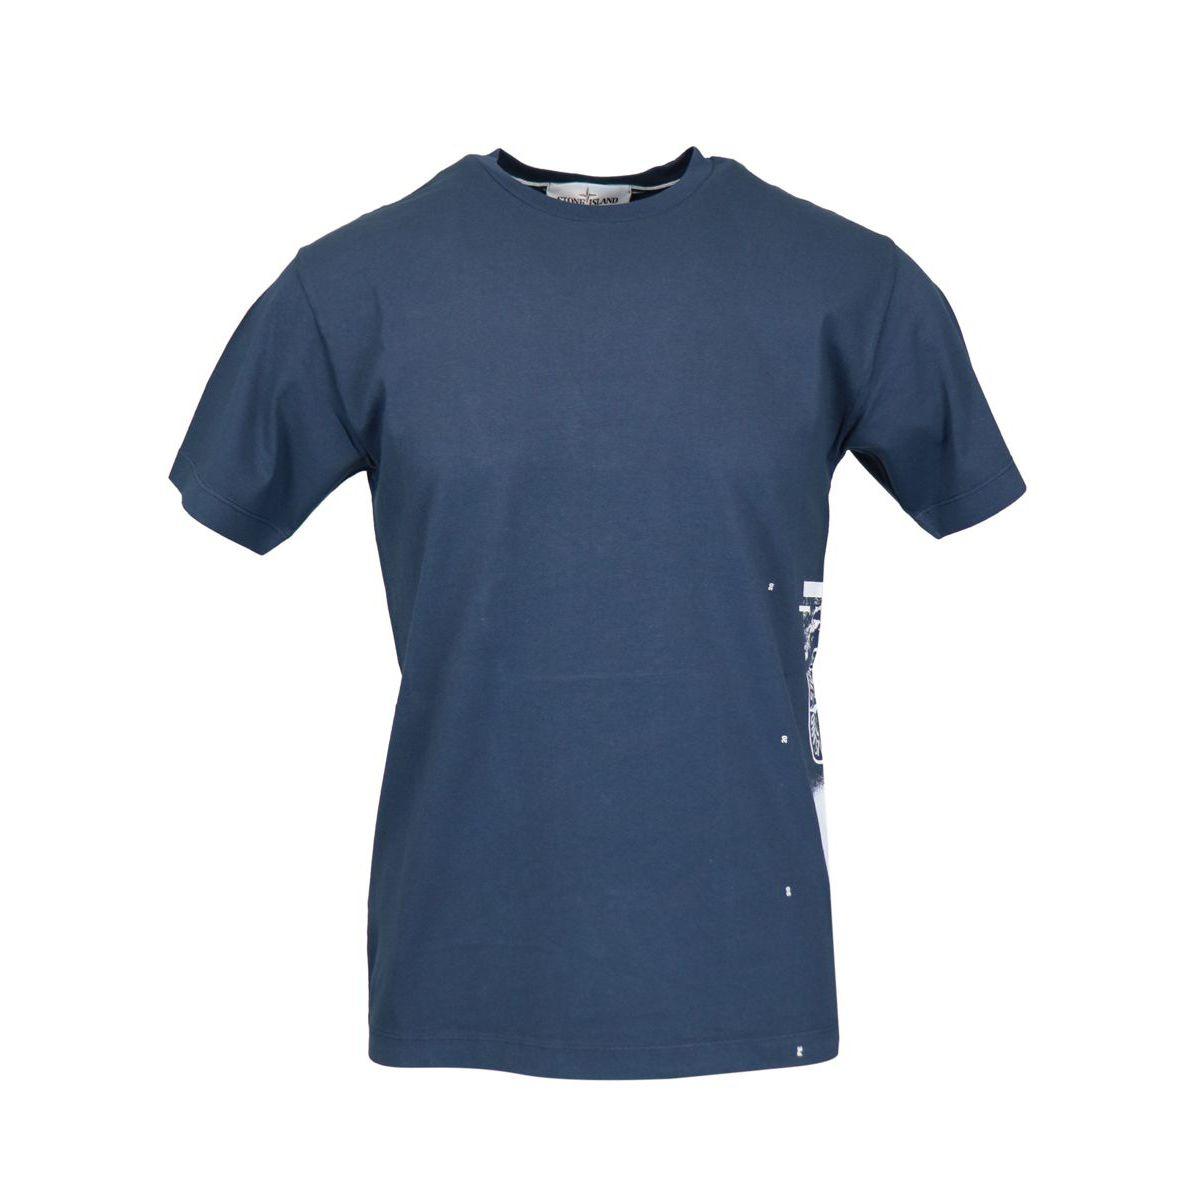 T-shirt in cotone con stampa logo laterale Blu marine Stone Island